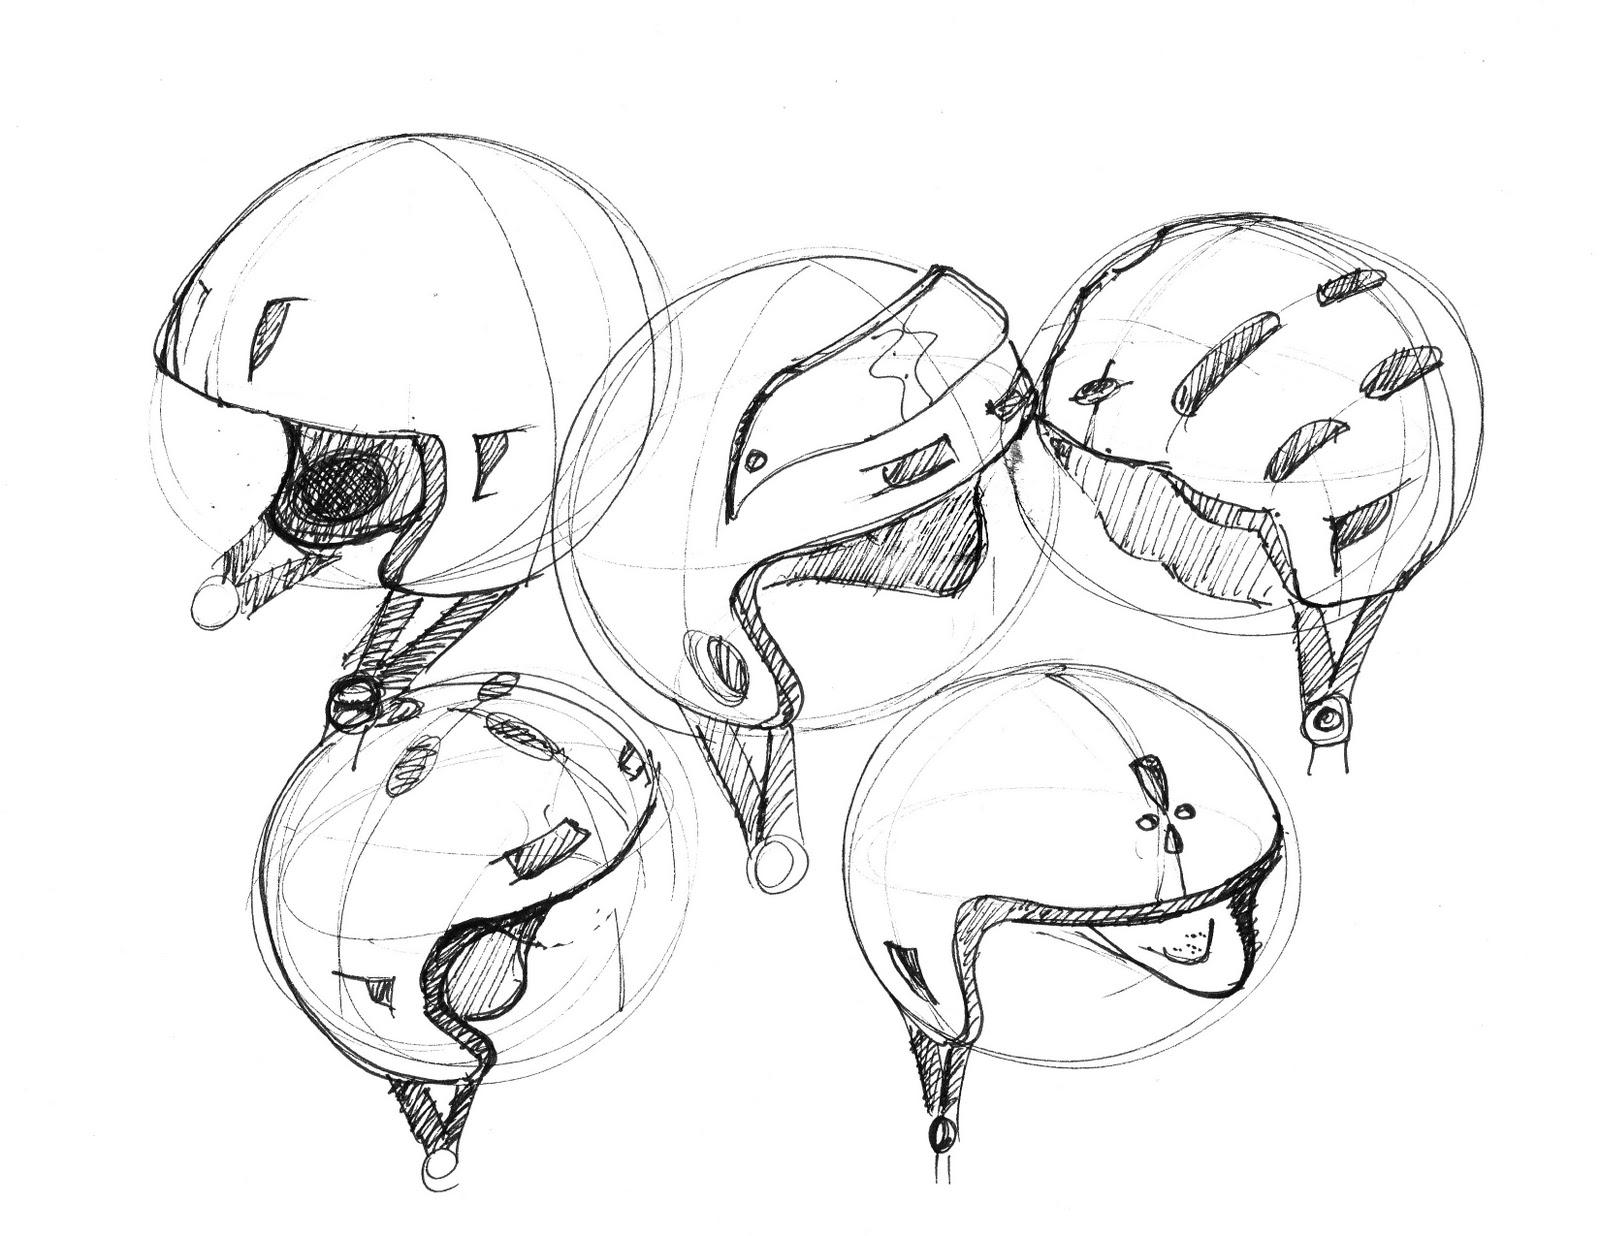 Rye Crowen Design: The helmets...